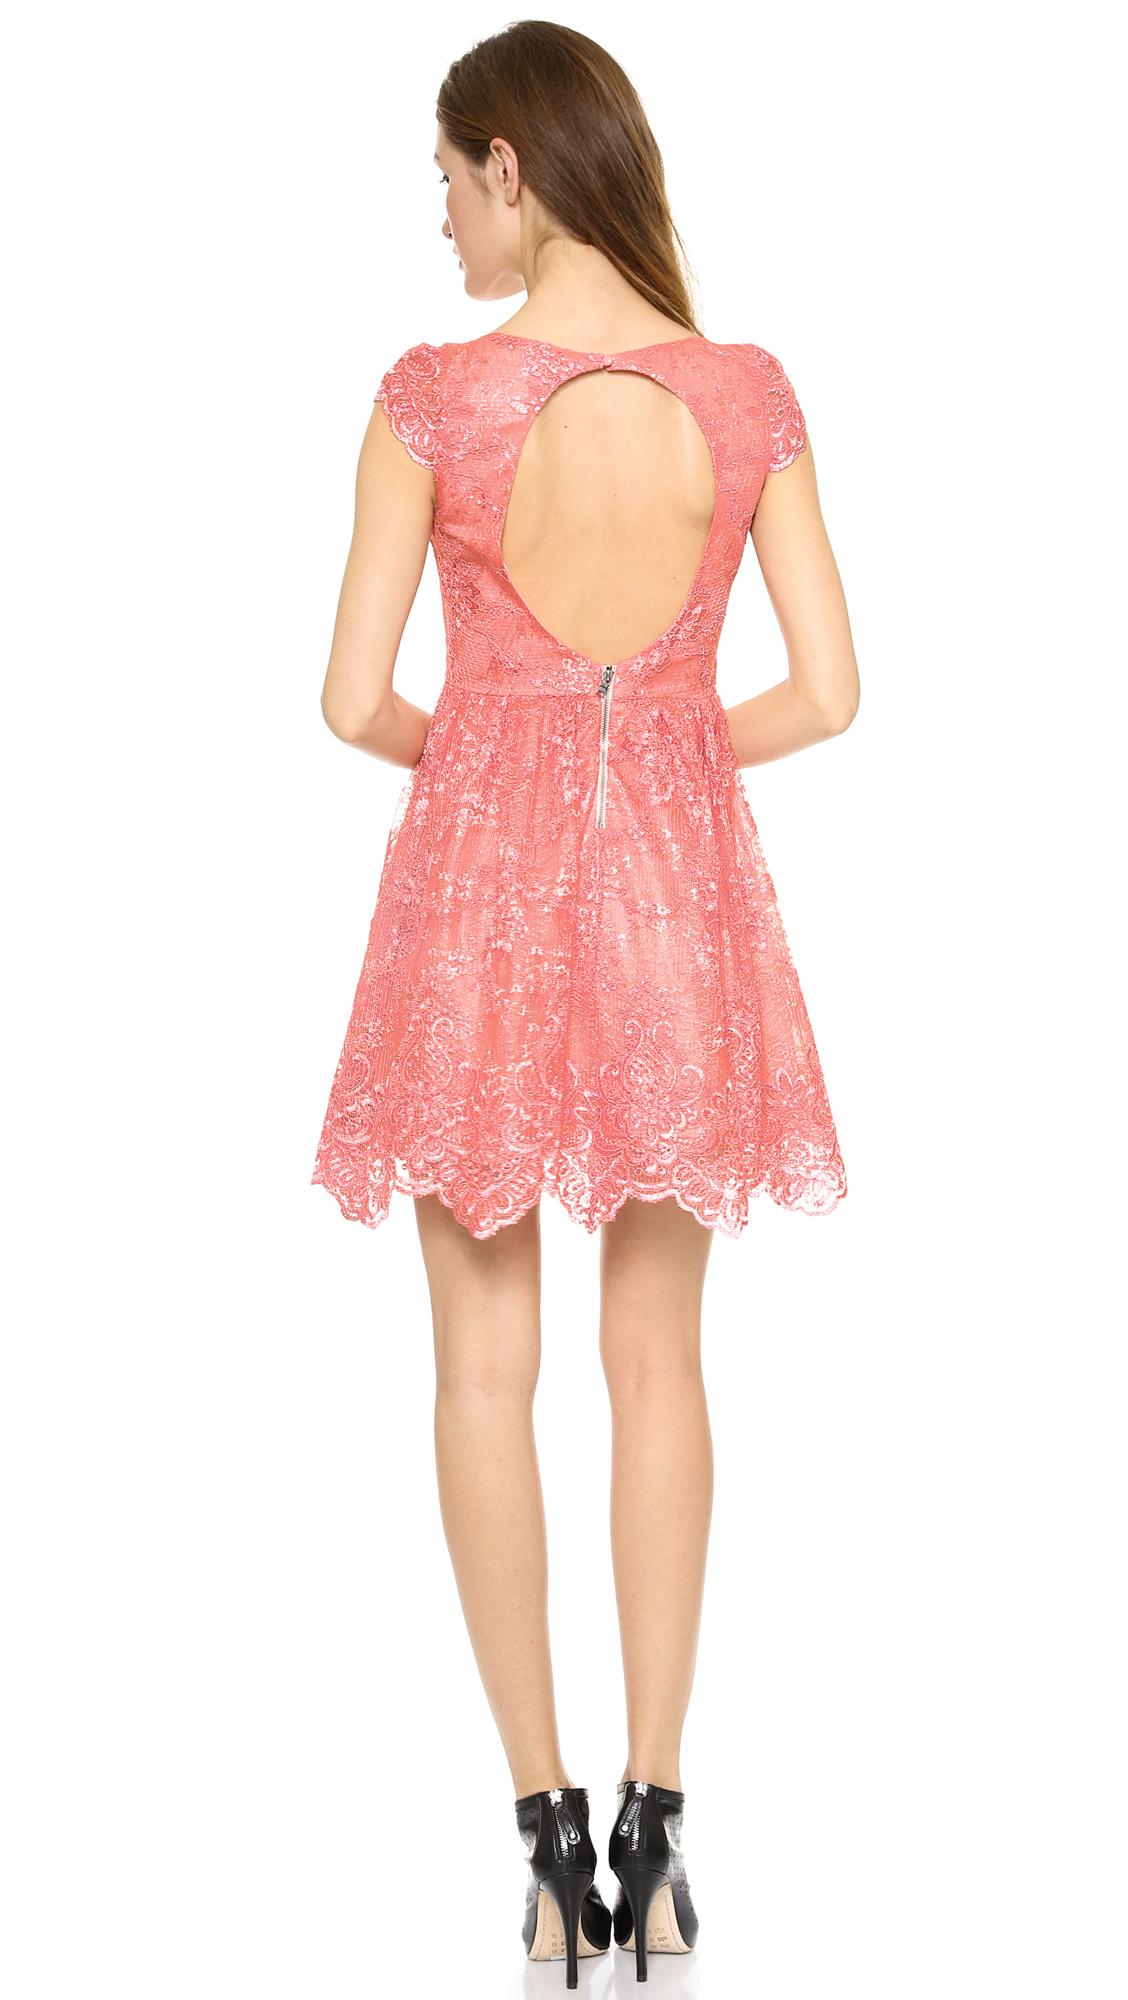 alice   olivia Zenden Lace Dress - SHOPBOP